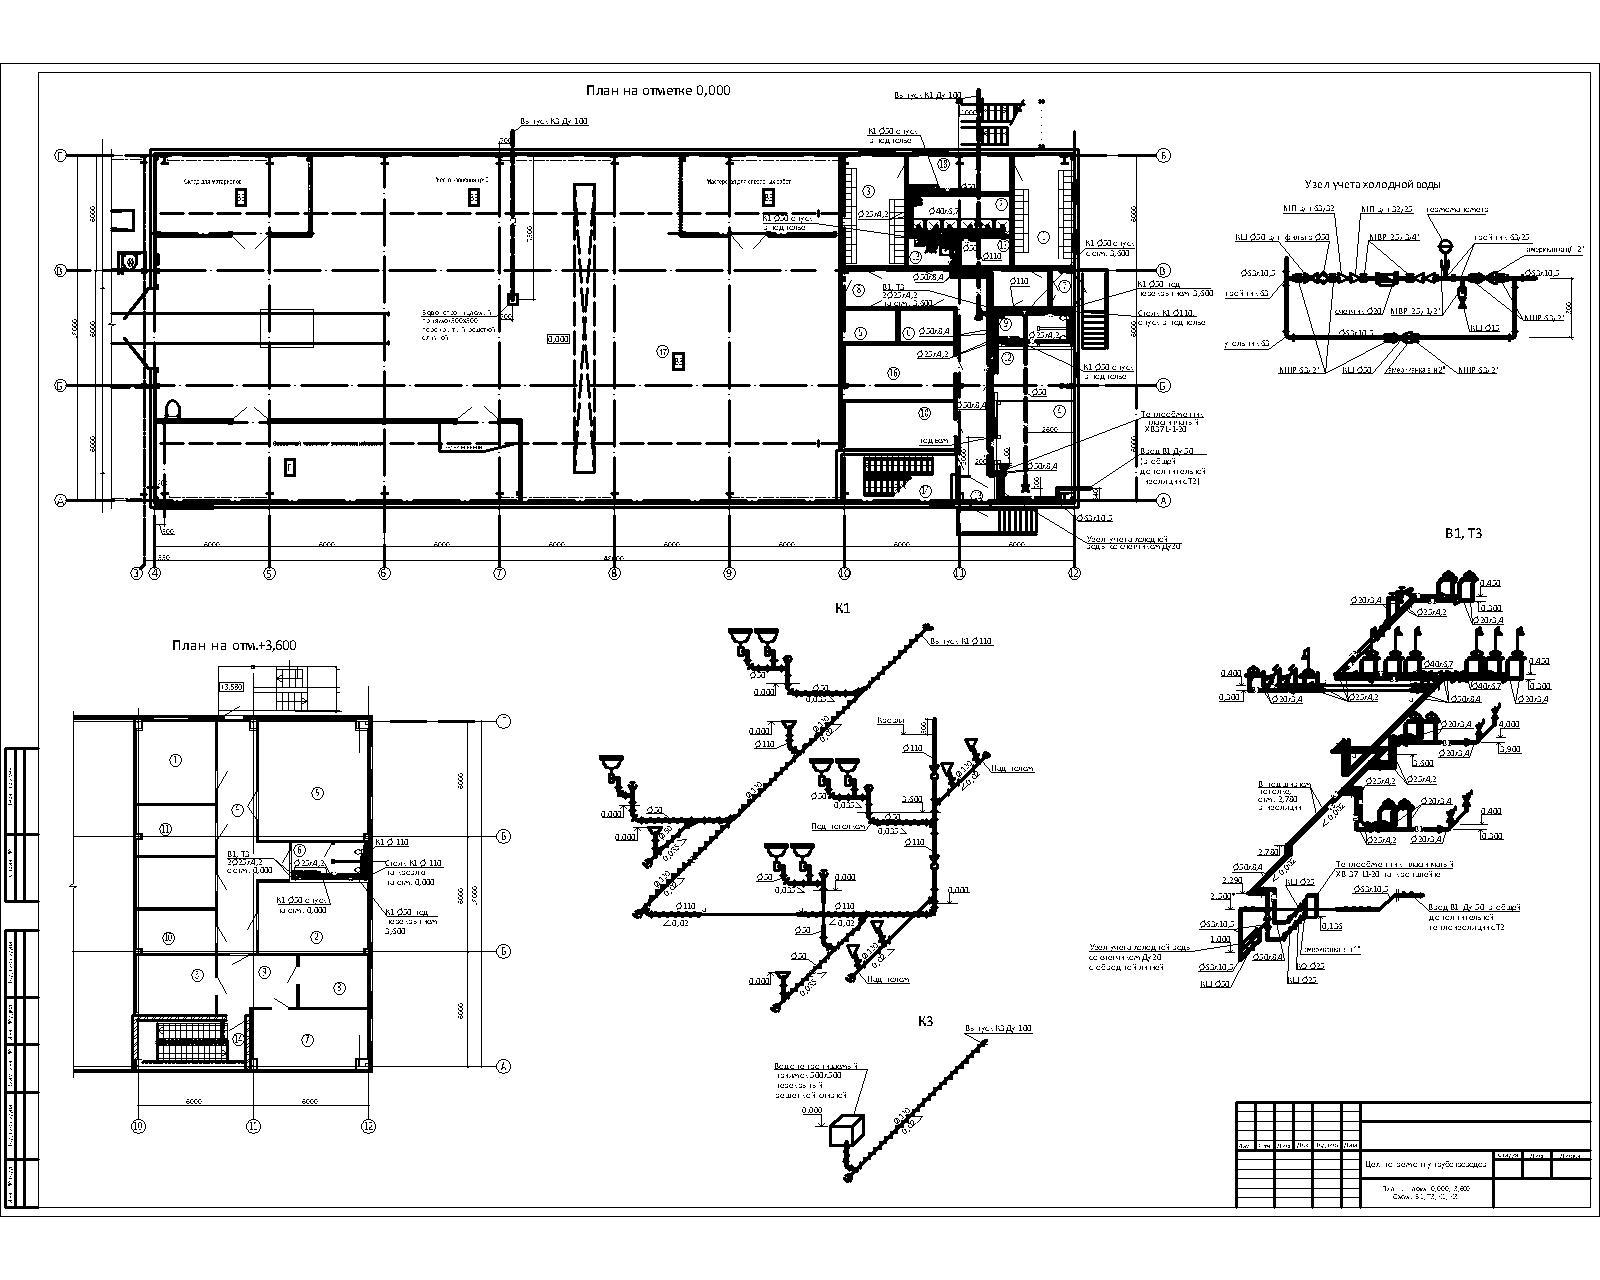 Отметки на схеме канализации